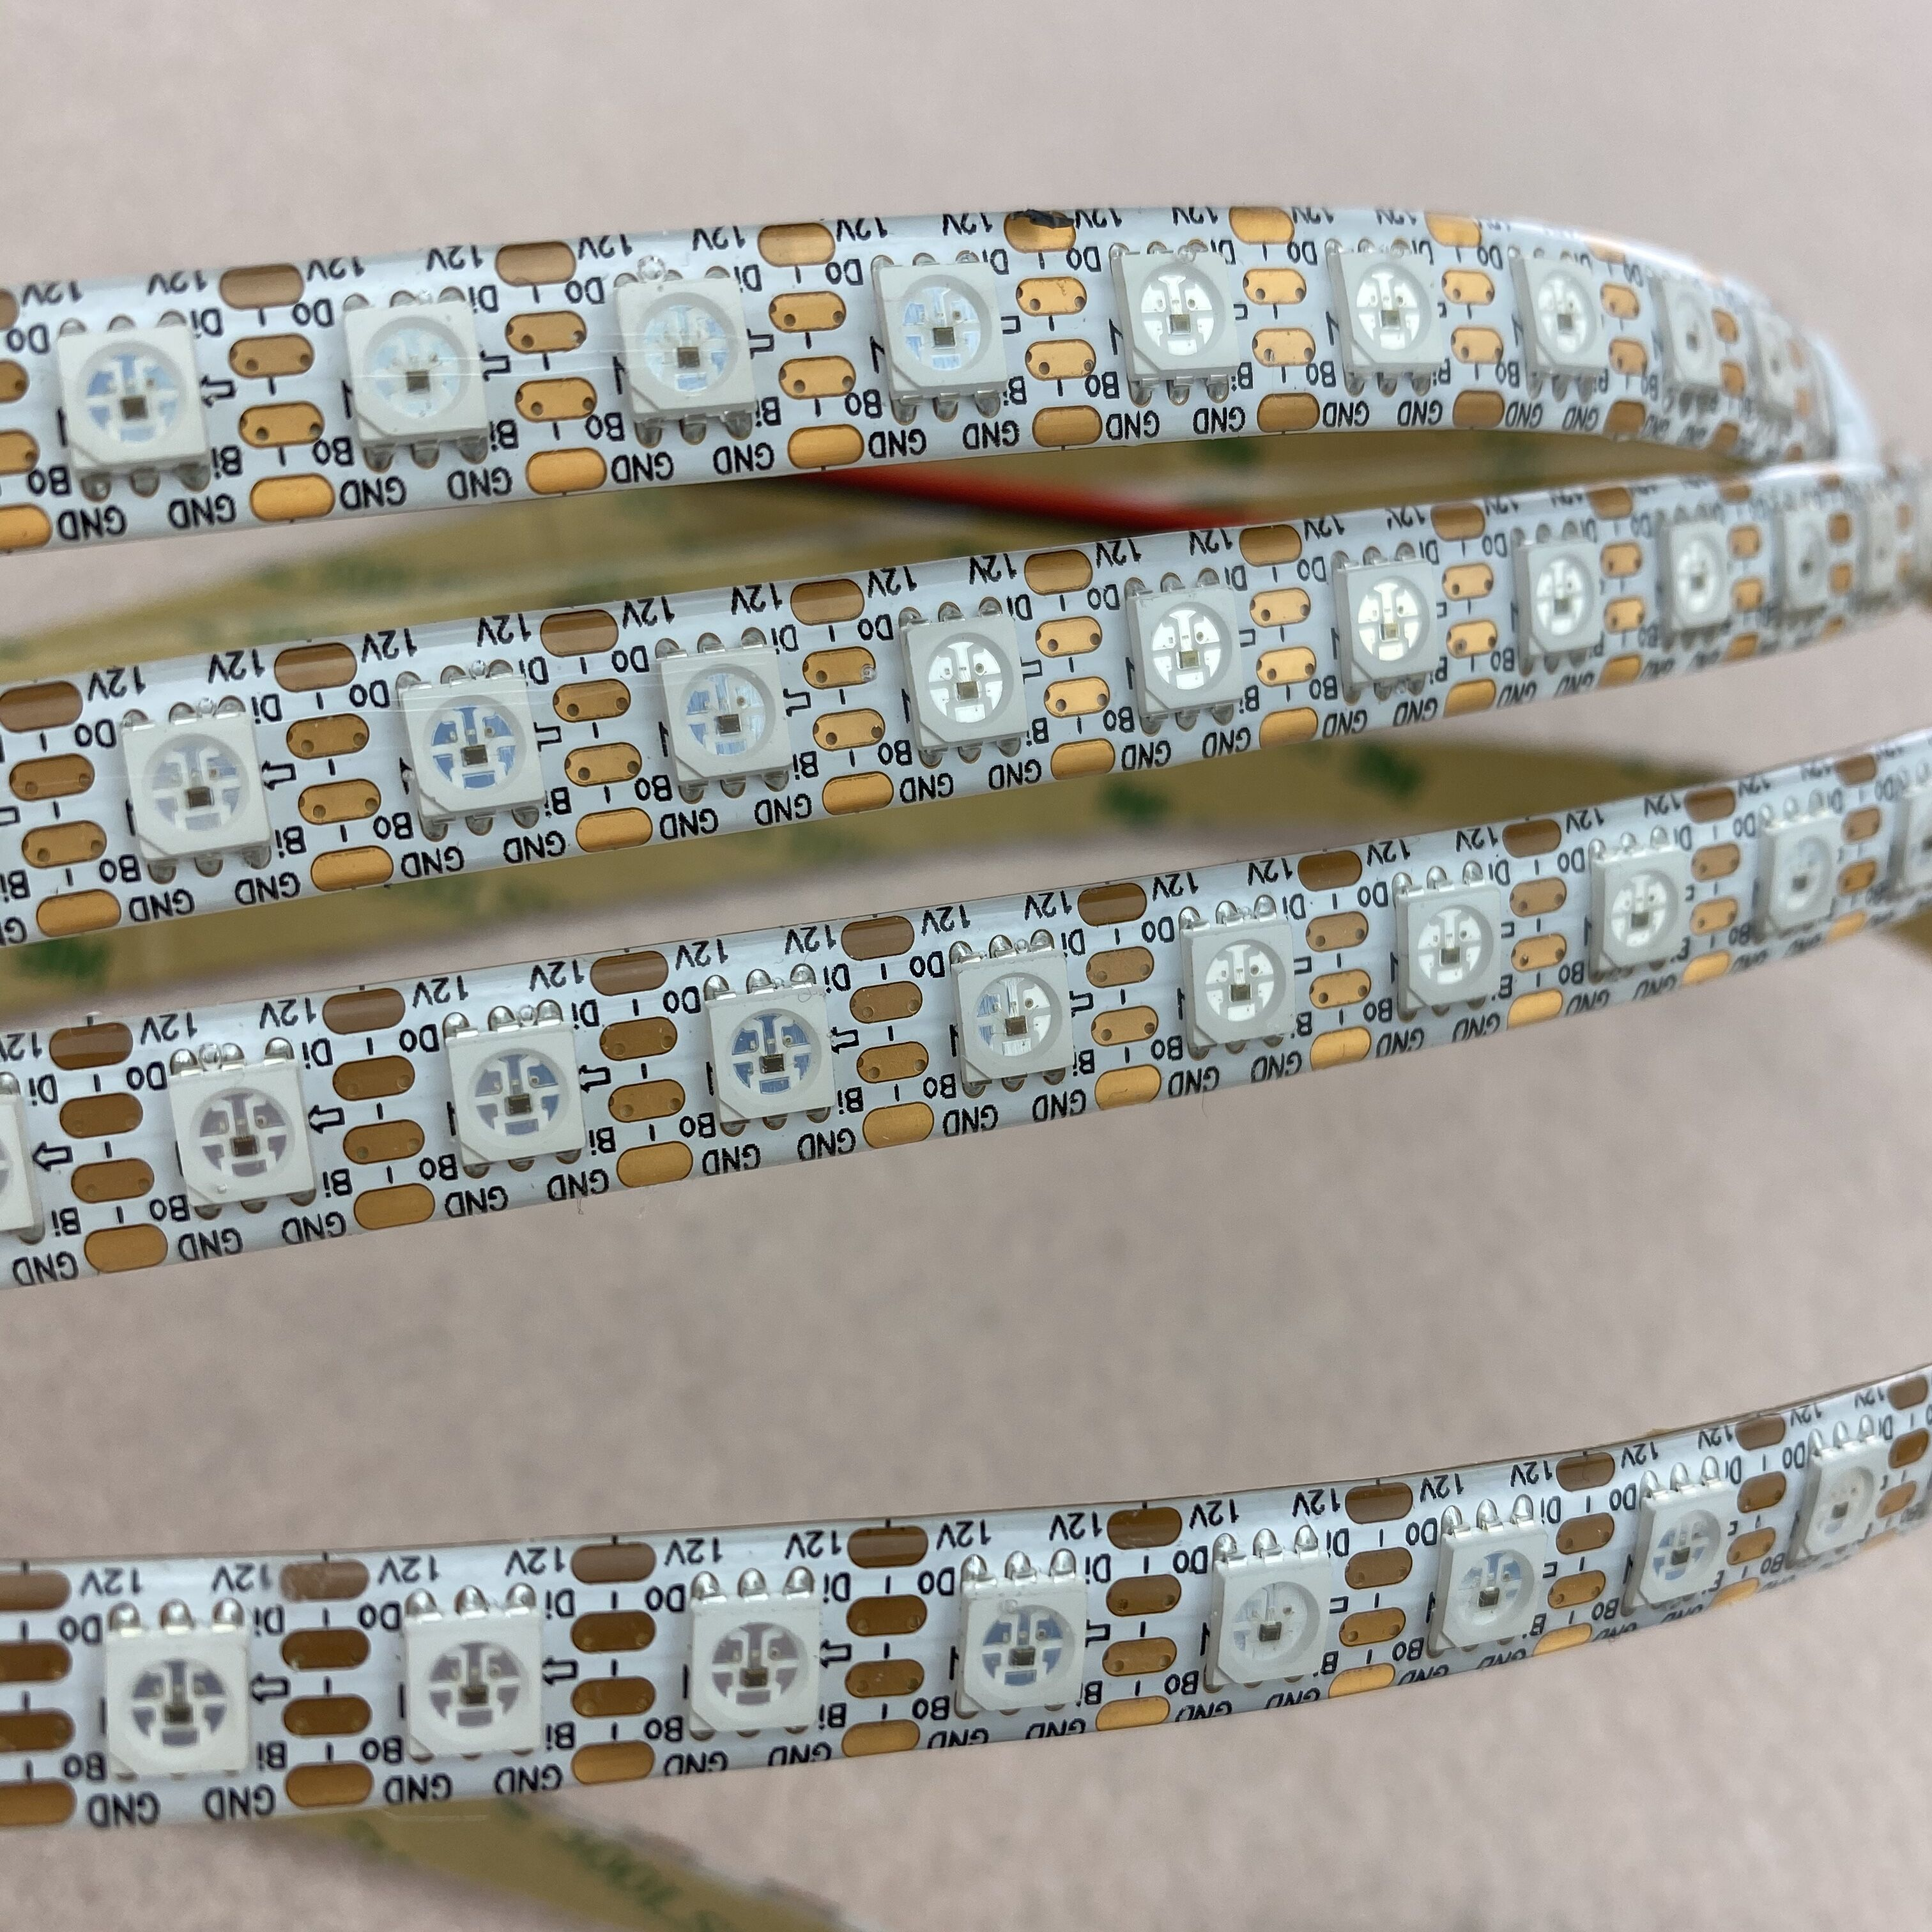 96leds/m SK6813HV-09-6P DC12V Addressable Full Color RGB 5050 LED Strip;4m;waterproof In Silicon Coating;IP65,WHITE PCB